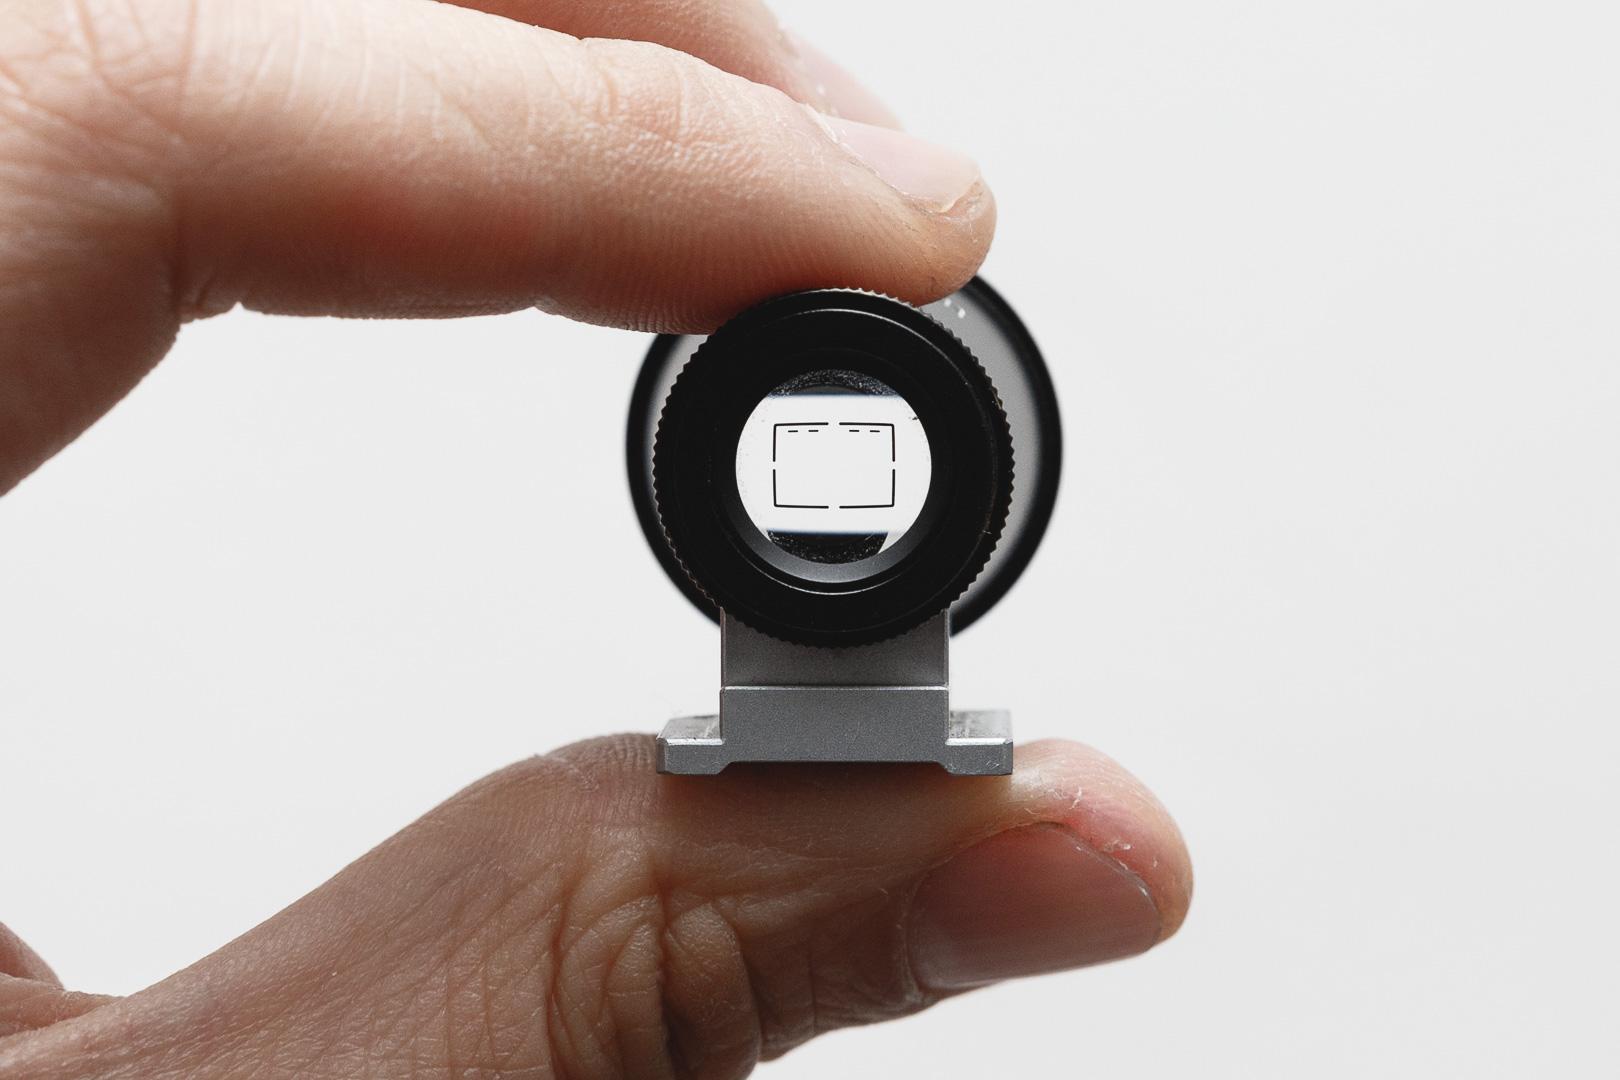 Voigtlander-35mm-Brightline-Finder-Ant Tran-20170402-3033.jpg